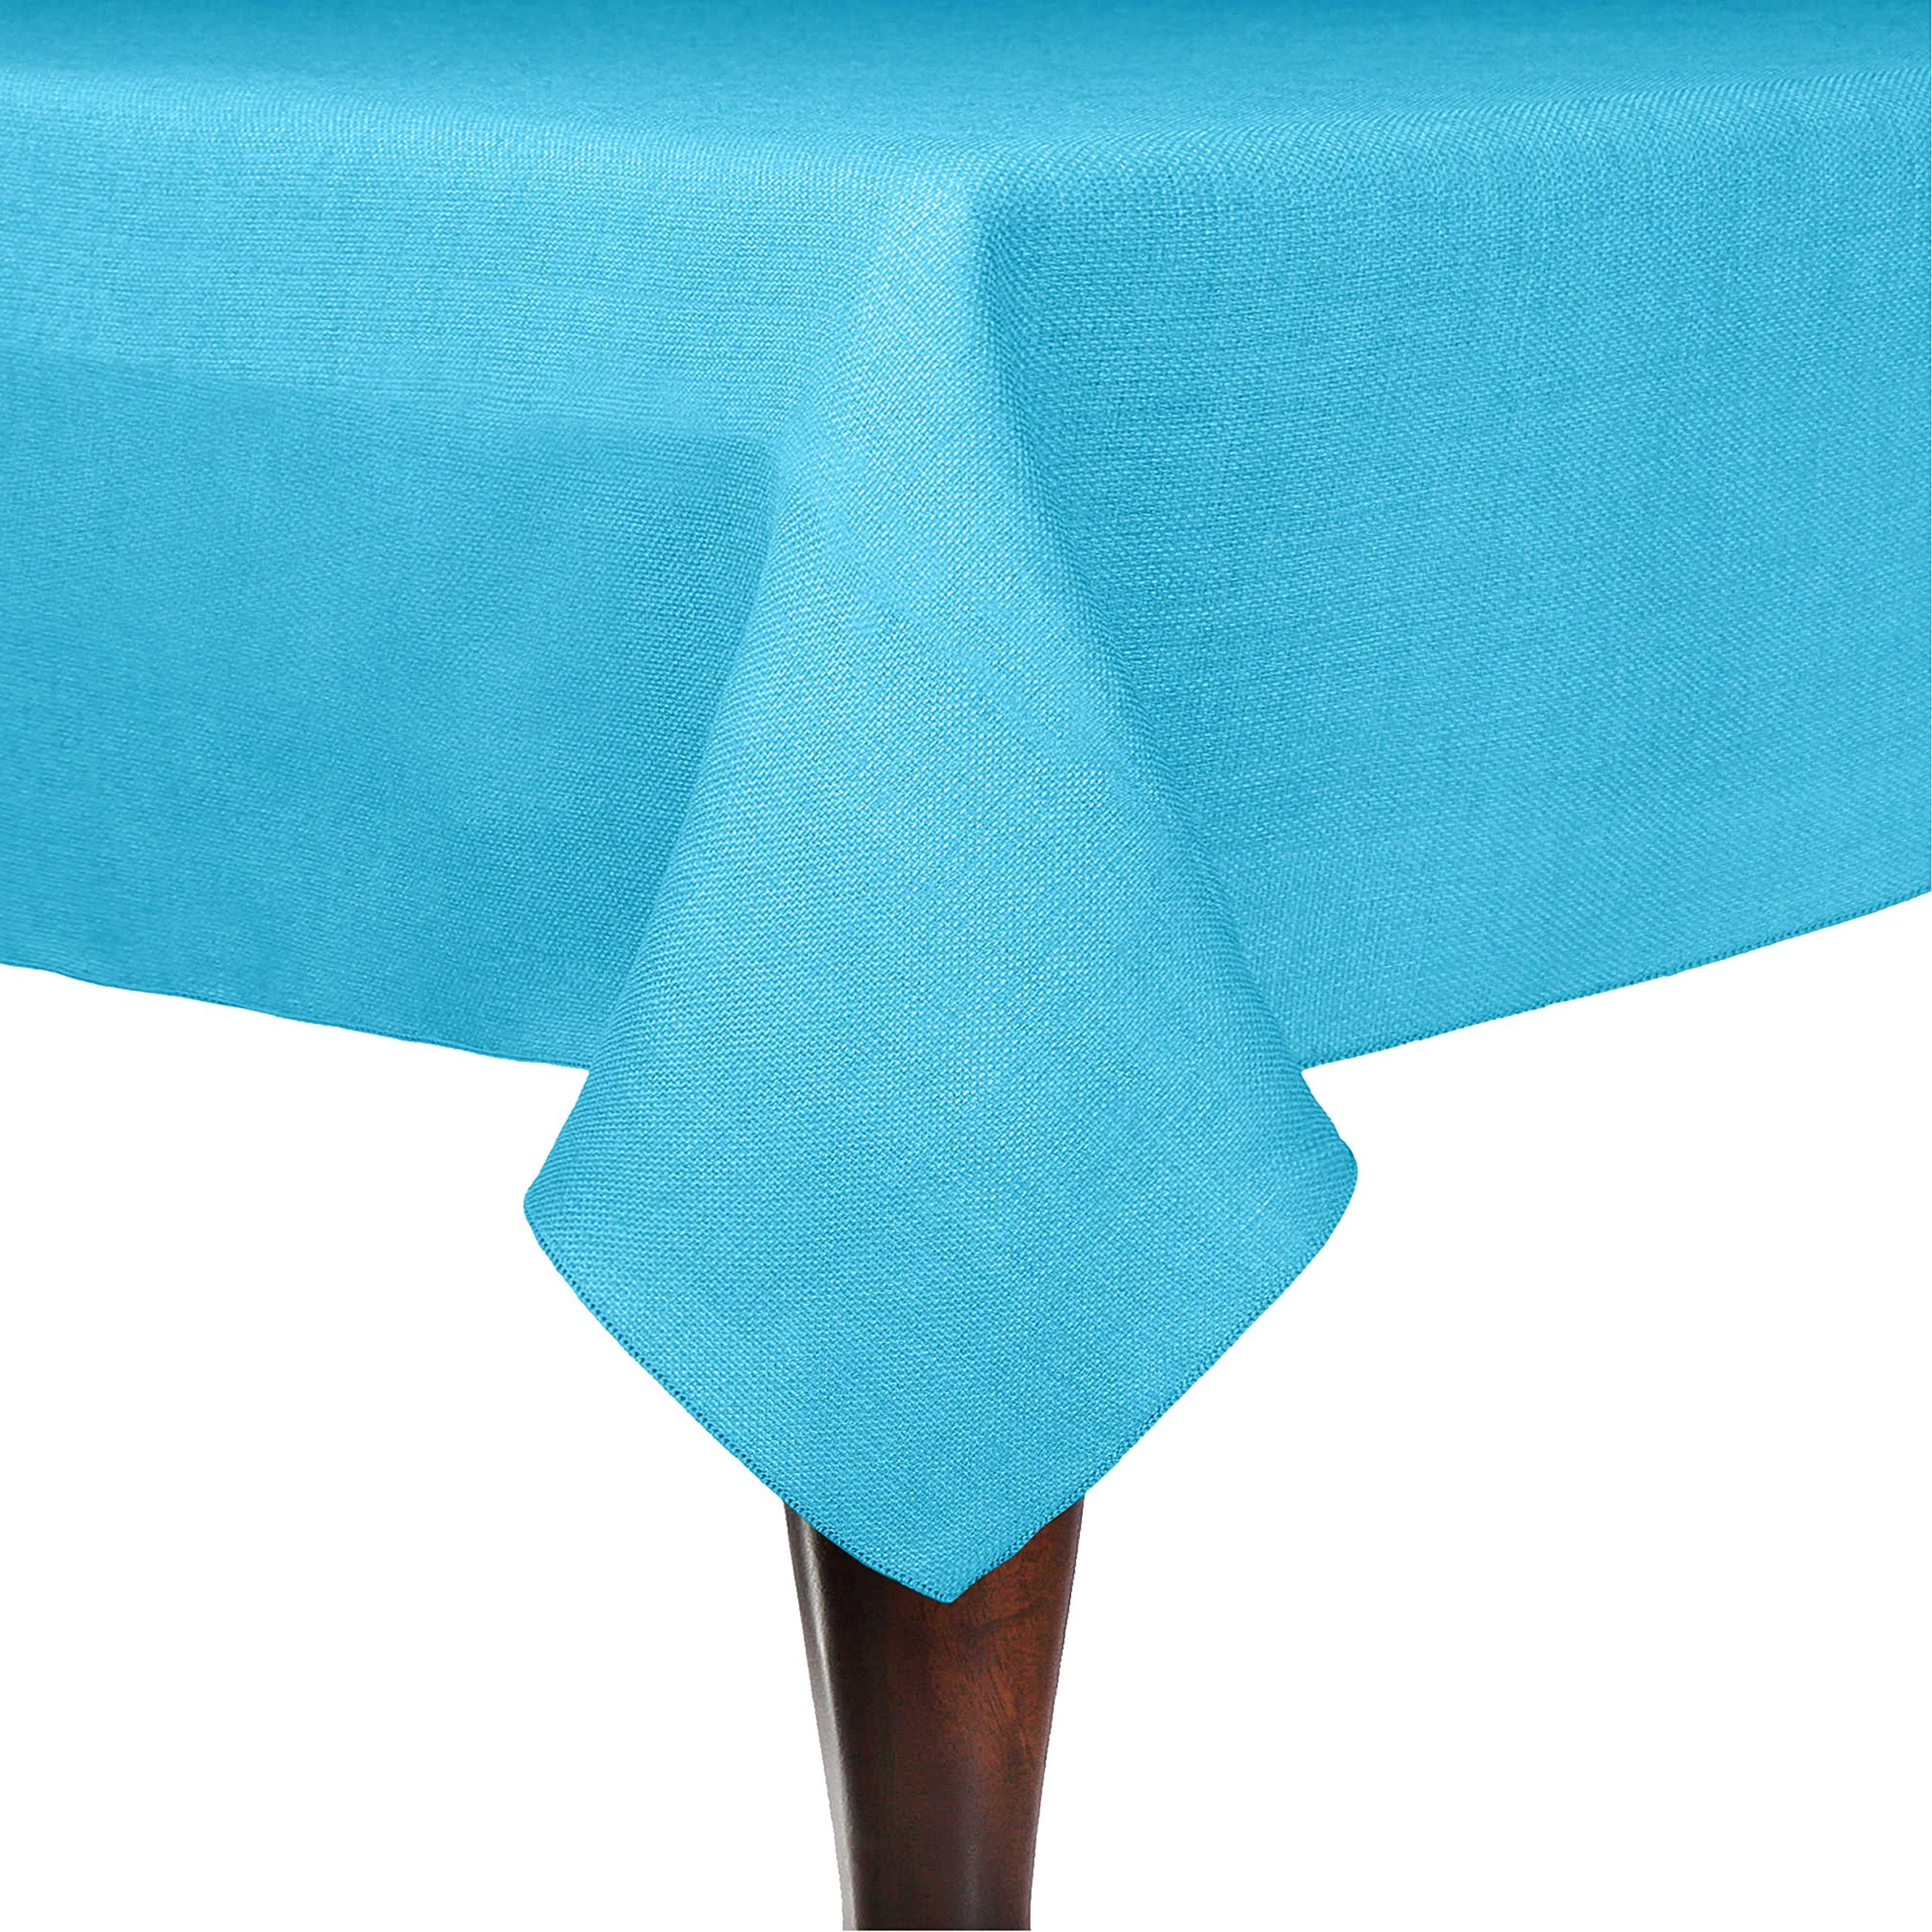 Ultimate Textile (5 Pack) Faux Burlap - Havana 60 x 120-Inch Rectangular Tablecloth - Basket Weave, Turquoise Blue